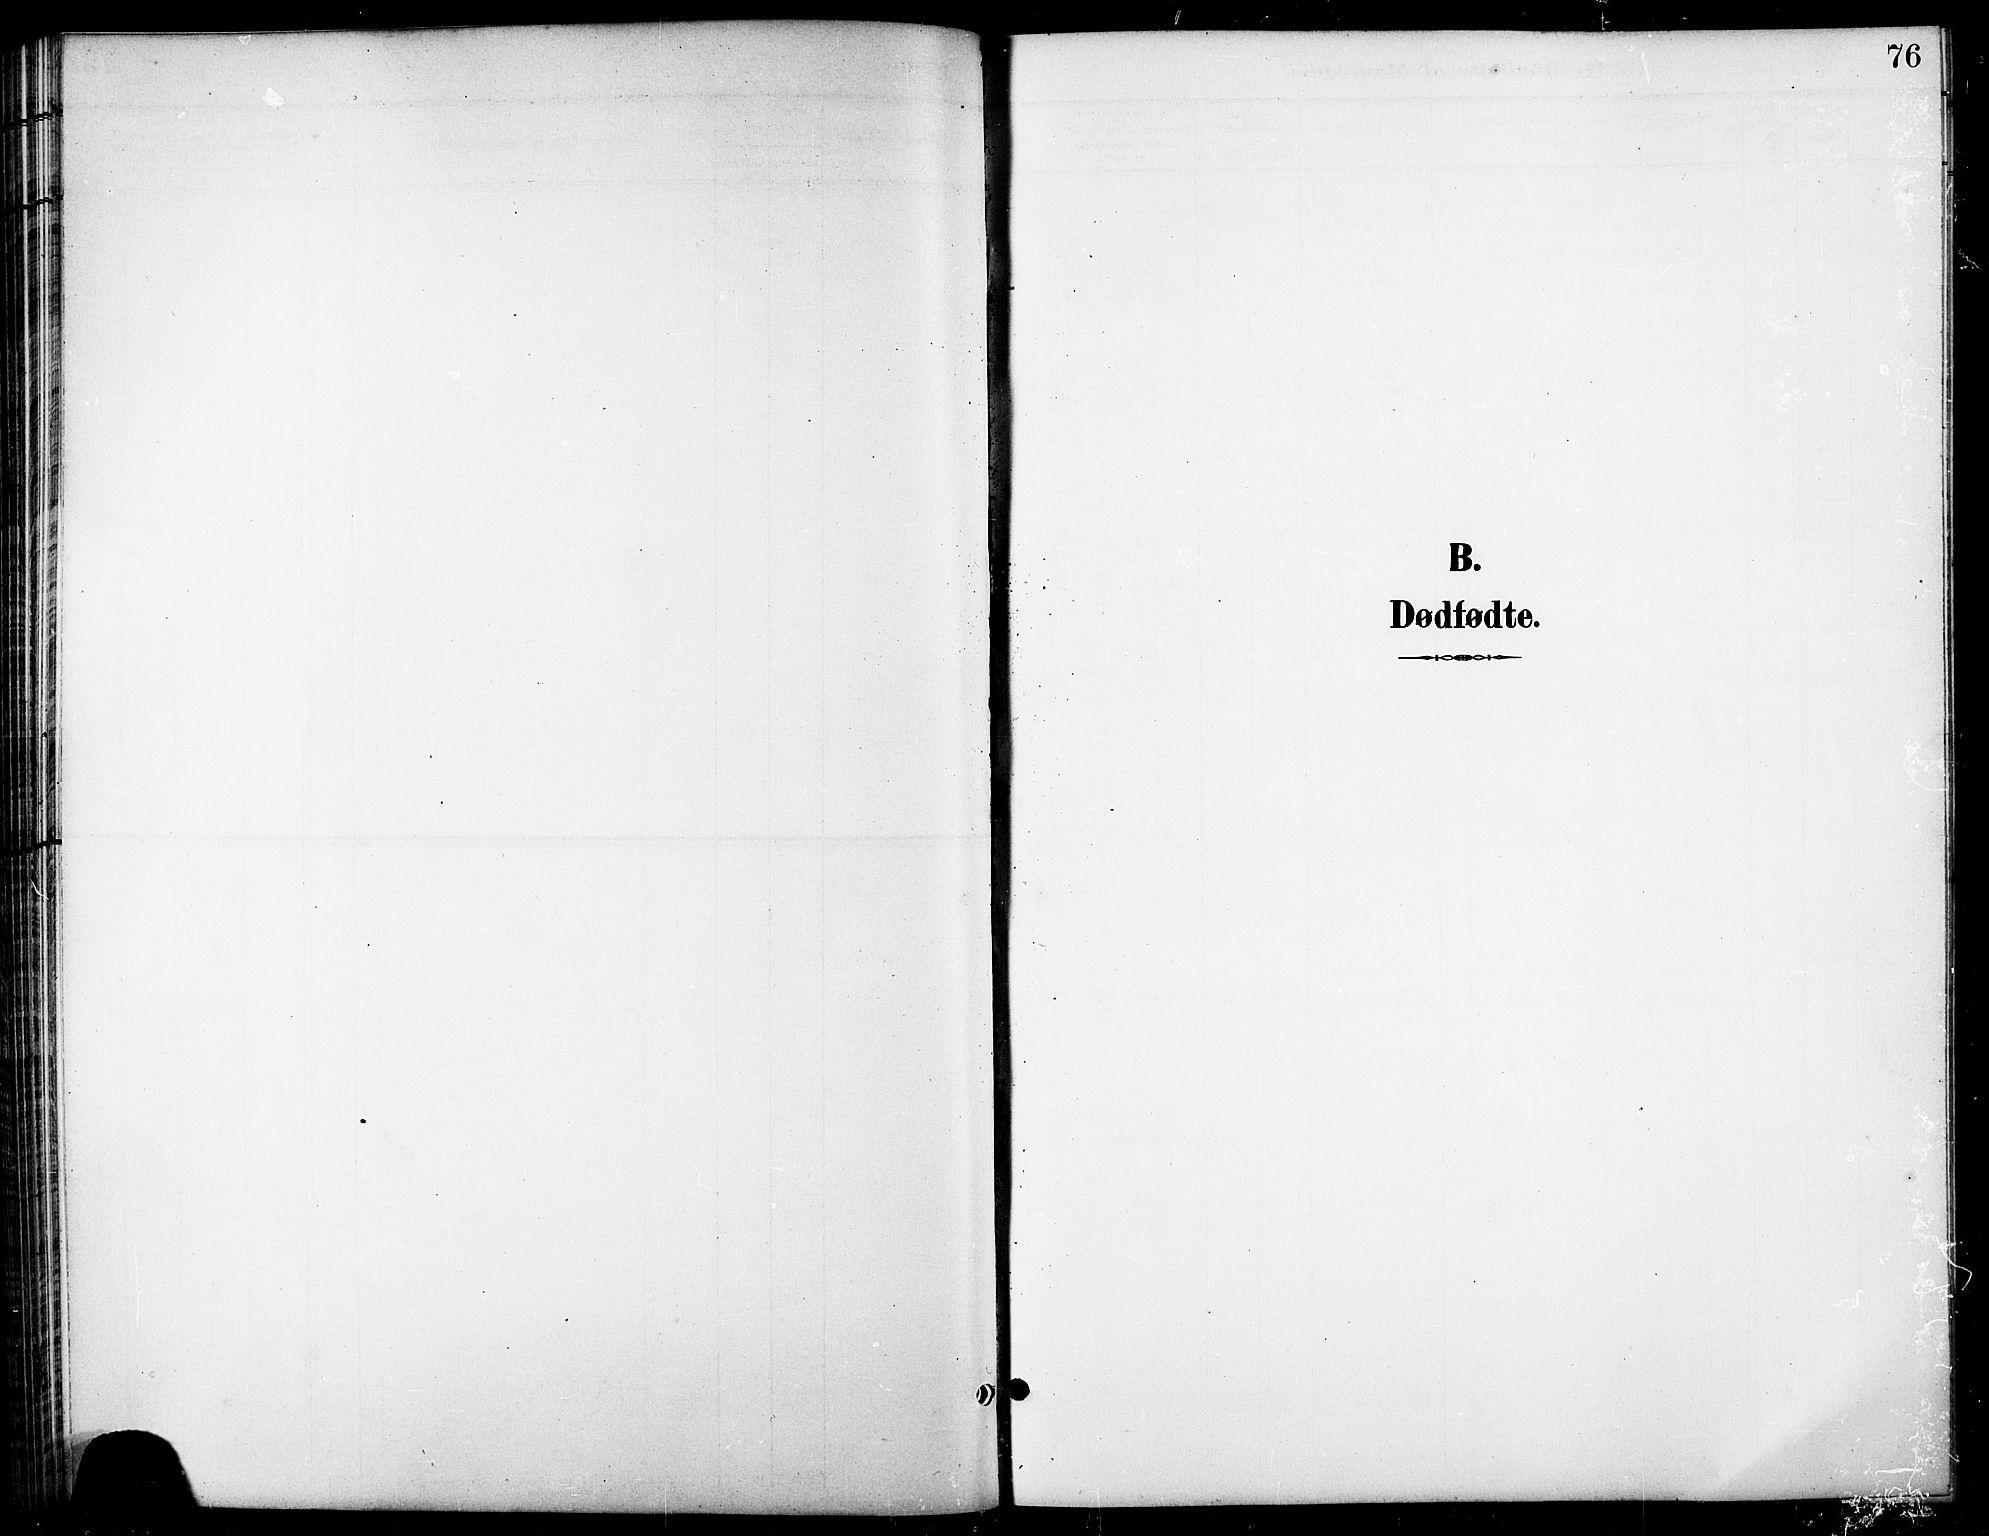 SATØ, Tranøy sokneprestkontor, I/Ia/Iab/L0014klokker: Klokkerbok nr. 14, 1896-1918, s. 76